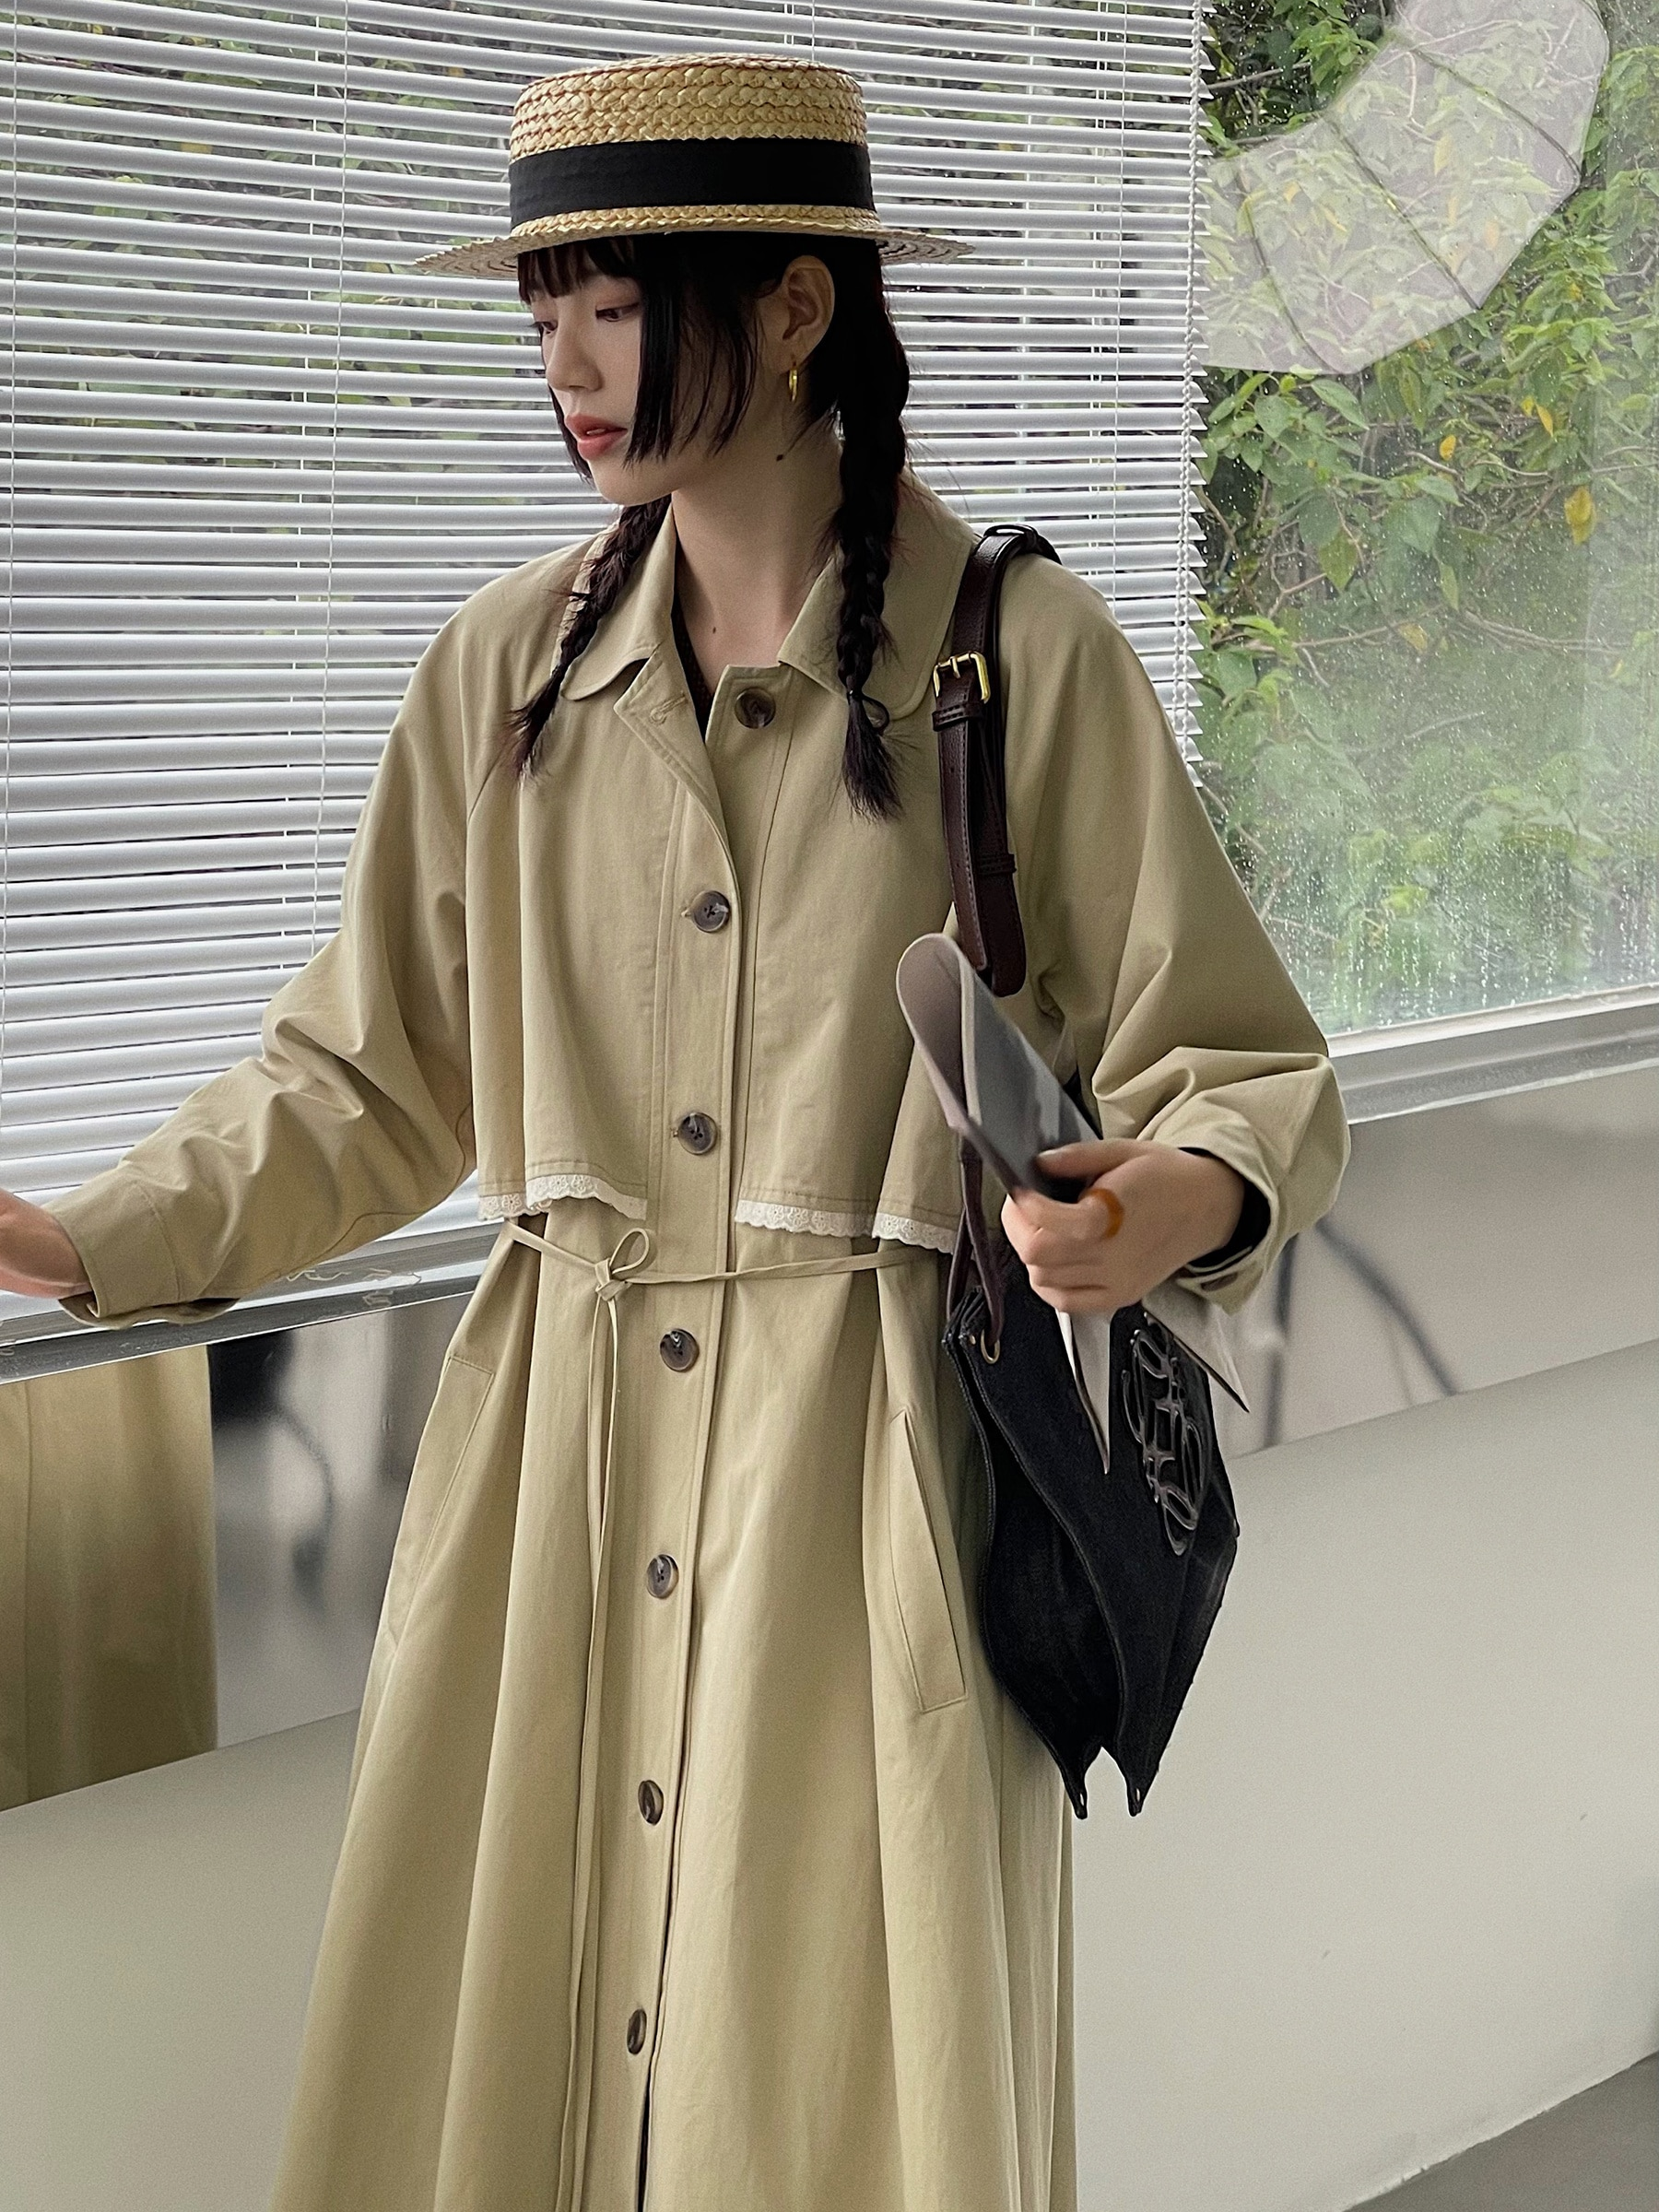 Fake Two-layer Splicing Cotton Windbreaker Coat 2021 Spring and Autumn New Fashion Long Khaki Women'